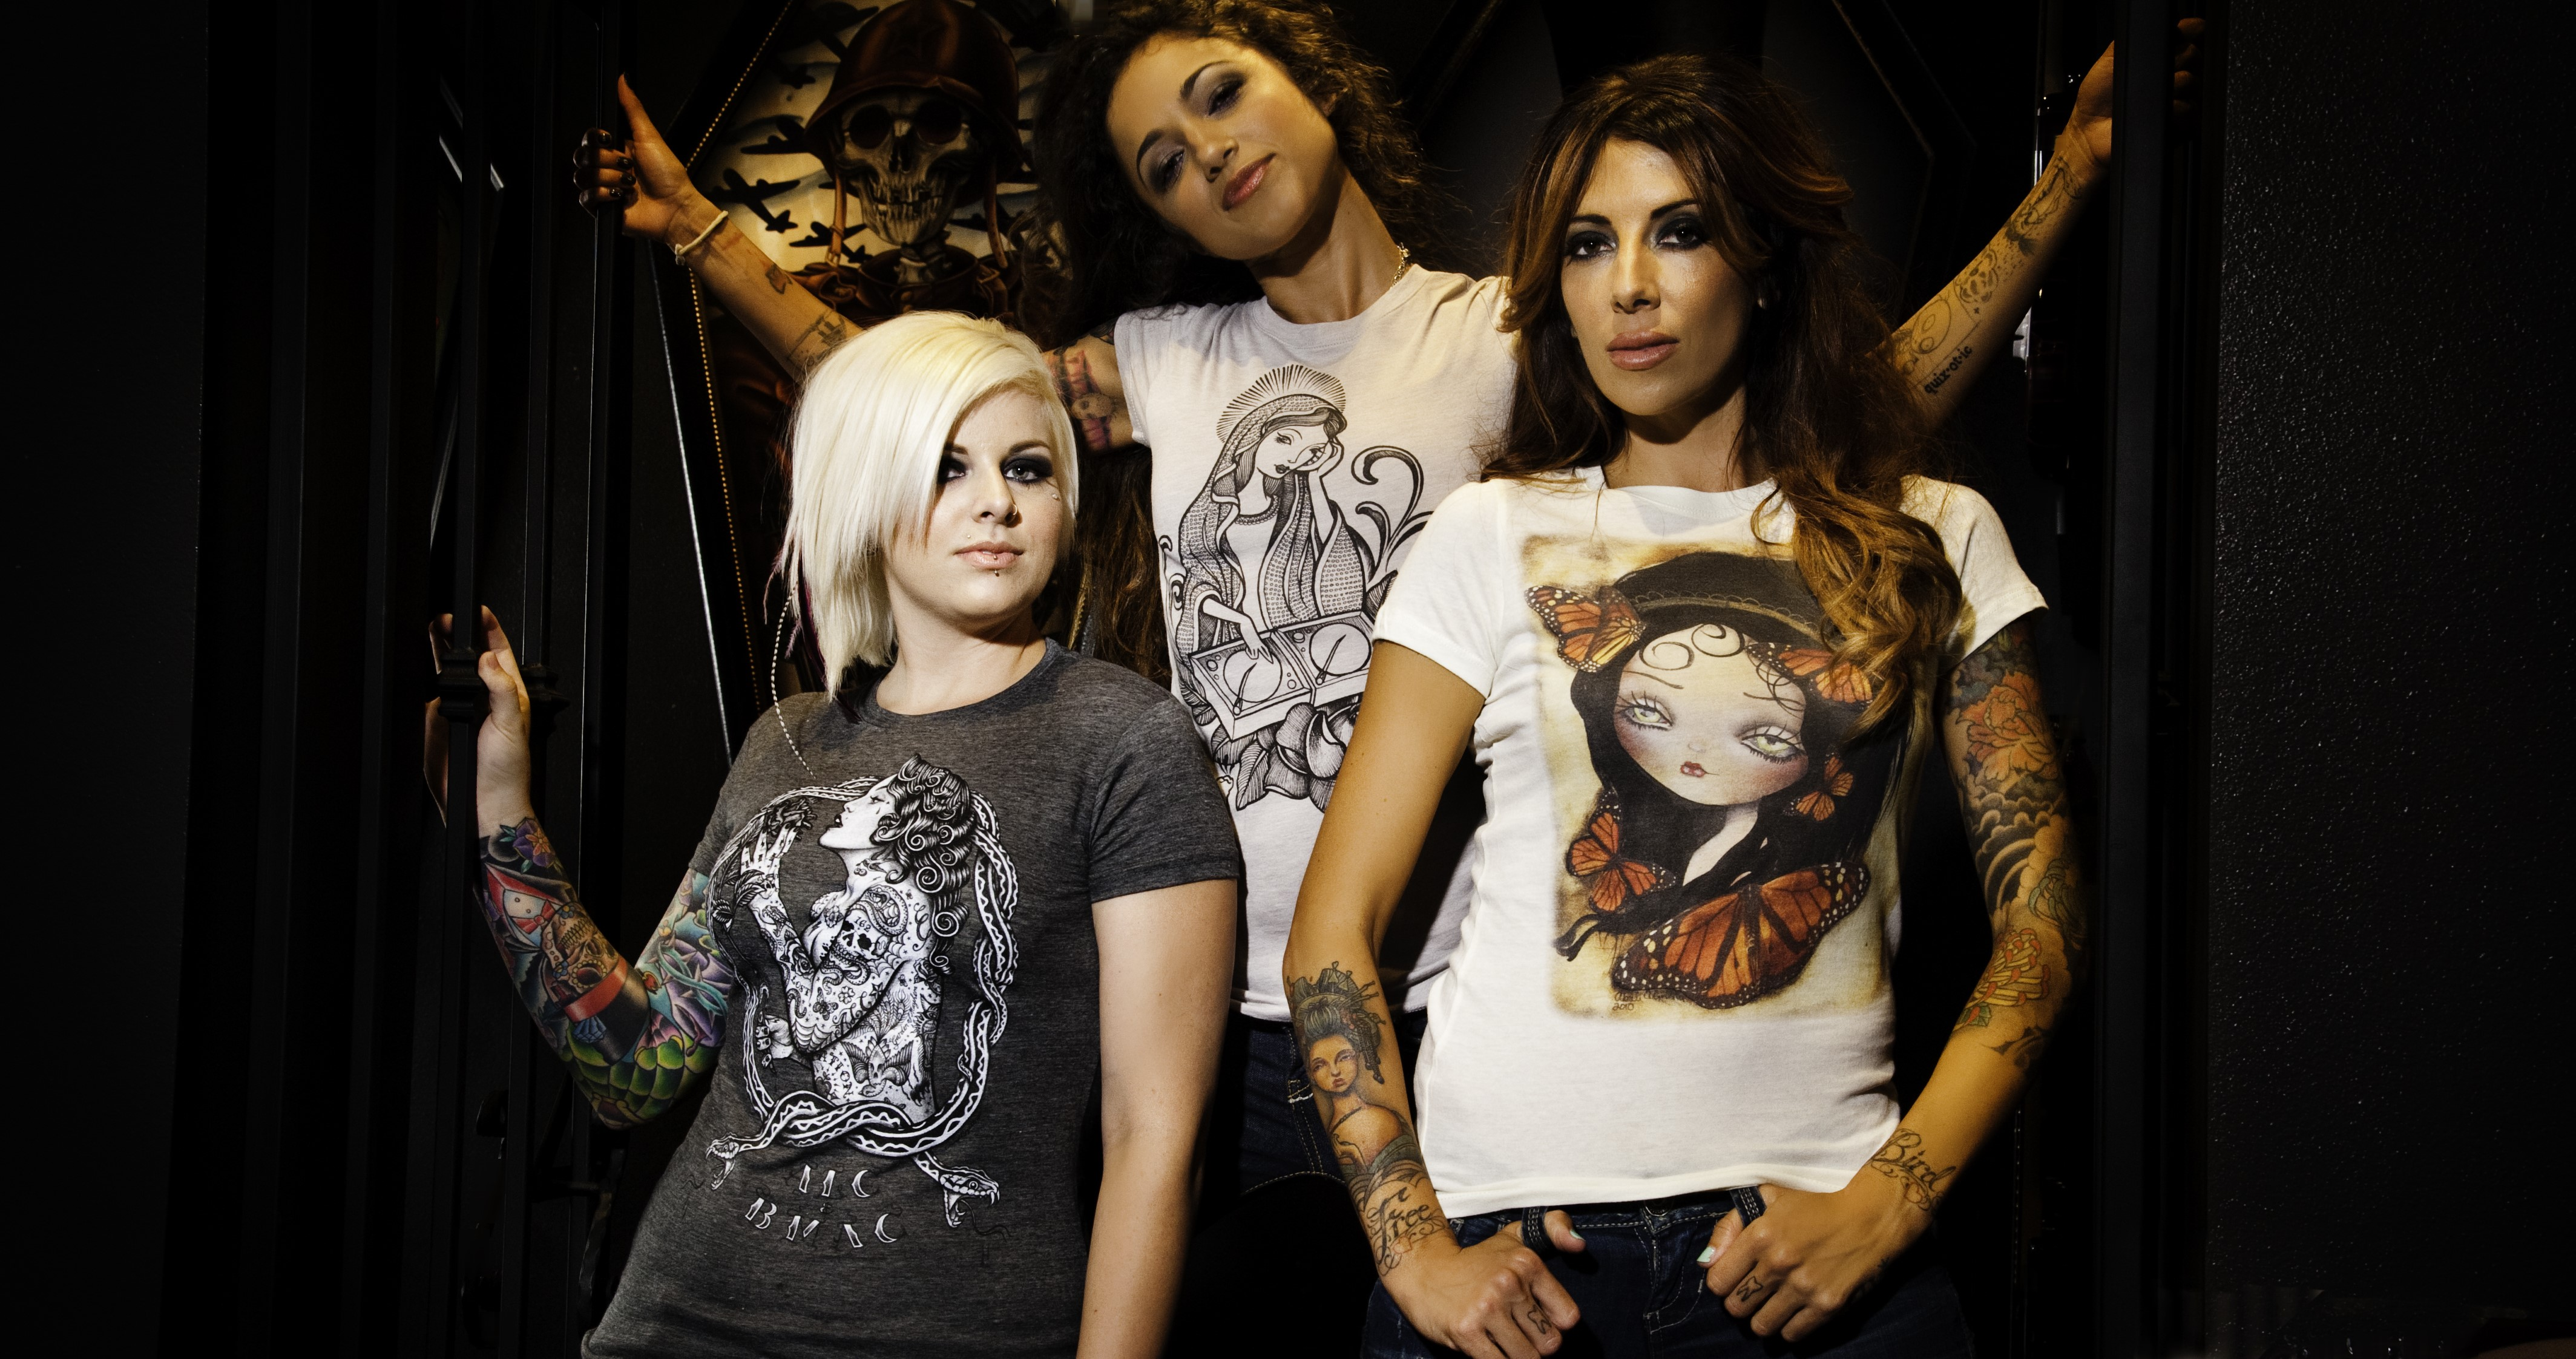 women-s-tattoo-clothing-apparel-banner.jpg